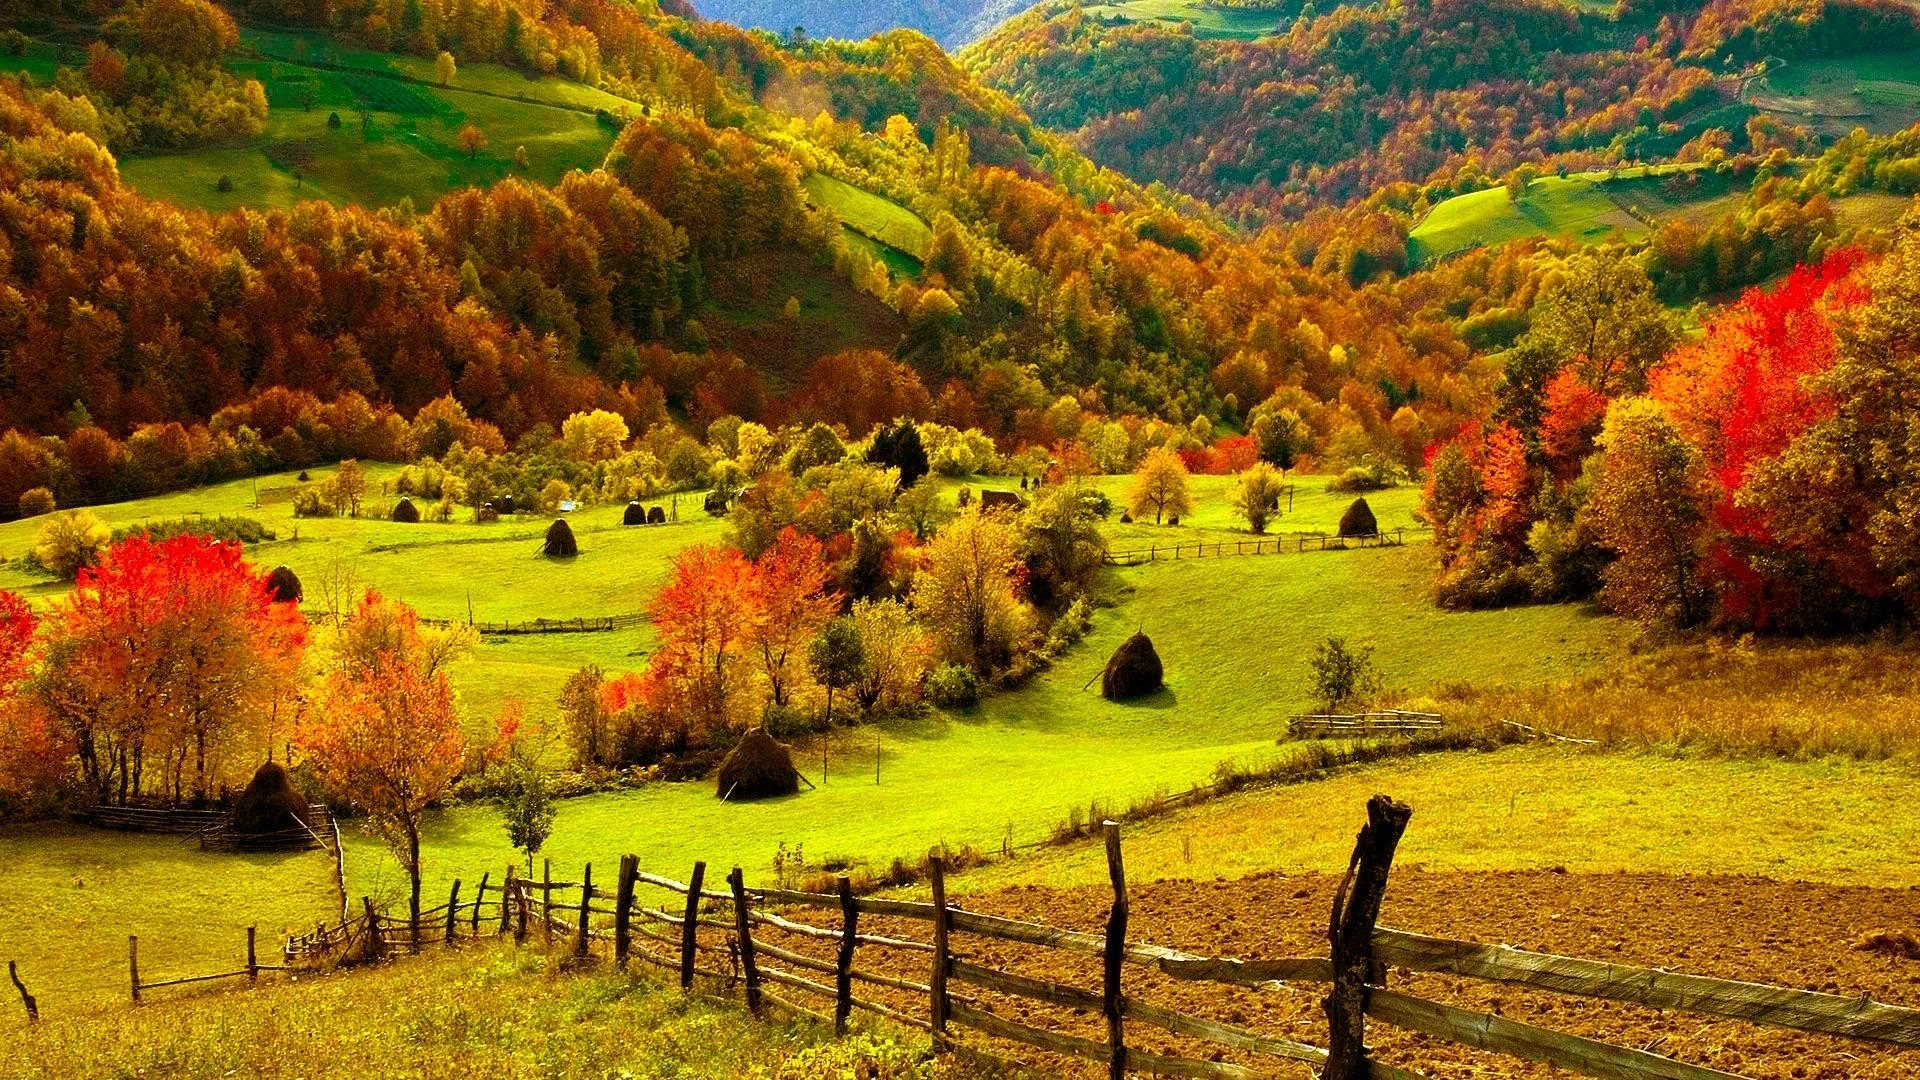 color scenic view bright wallpaper 1920x1080 26225 WallpaperUP 1920x1080